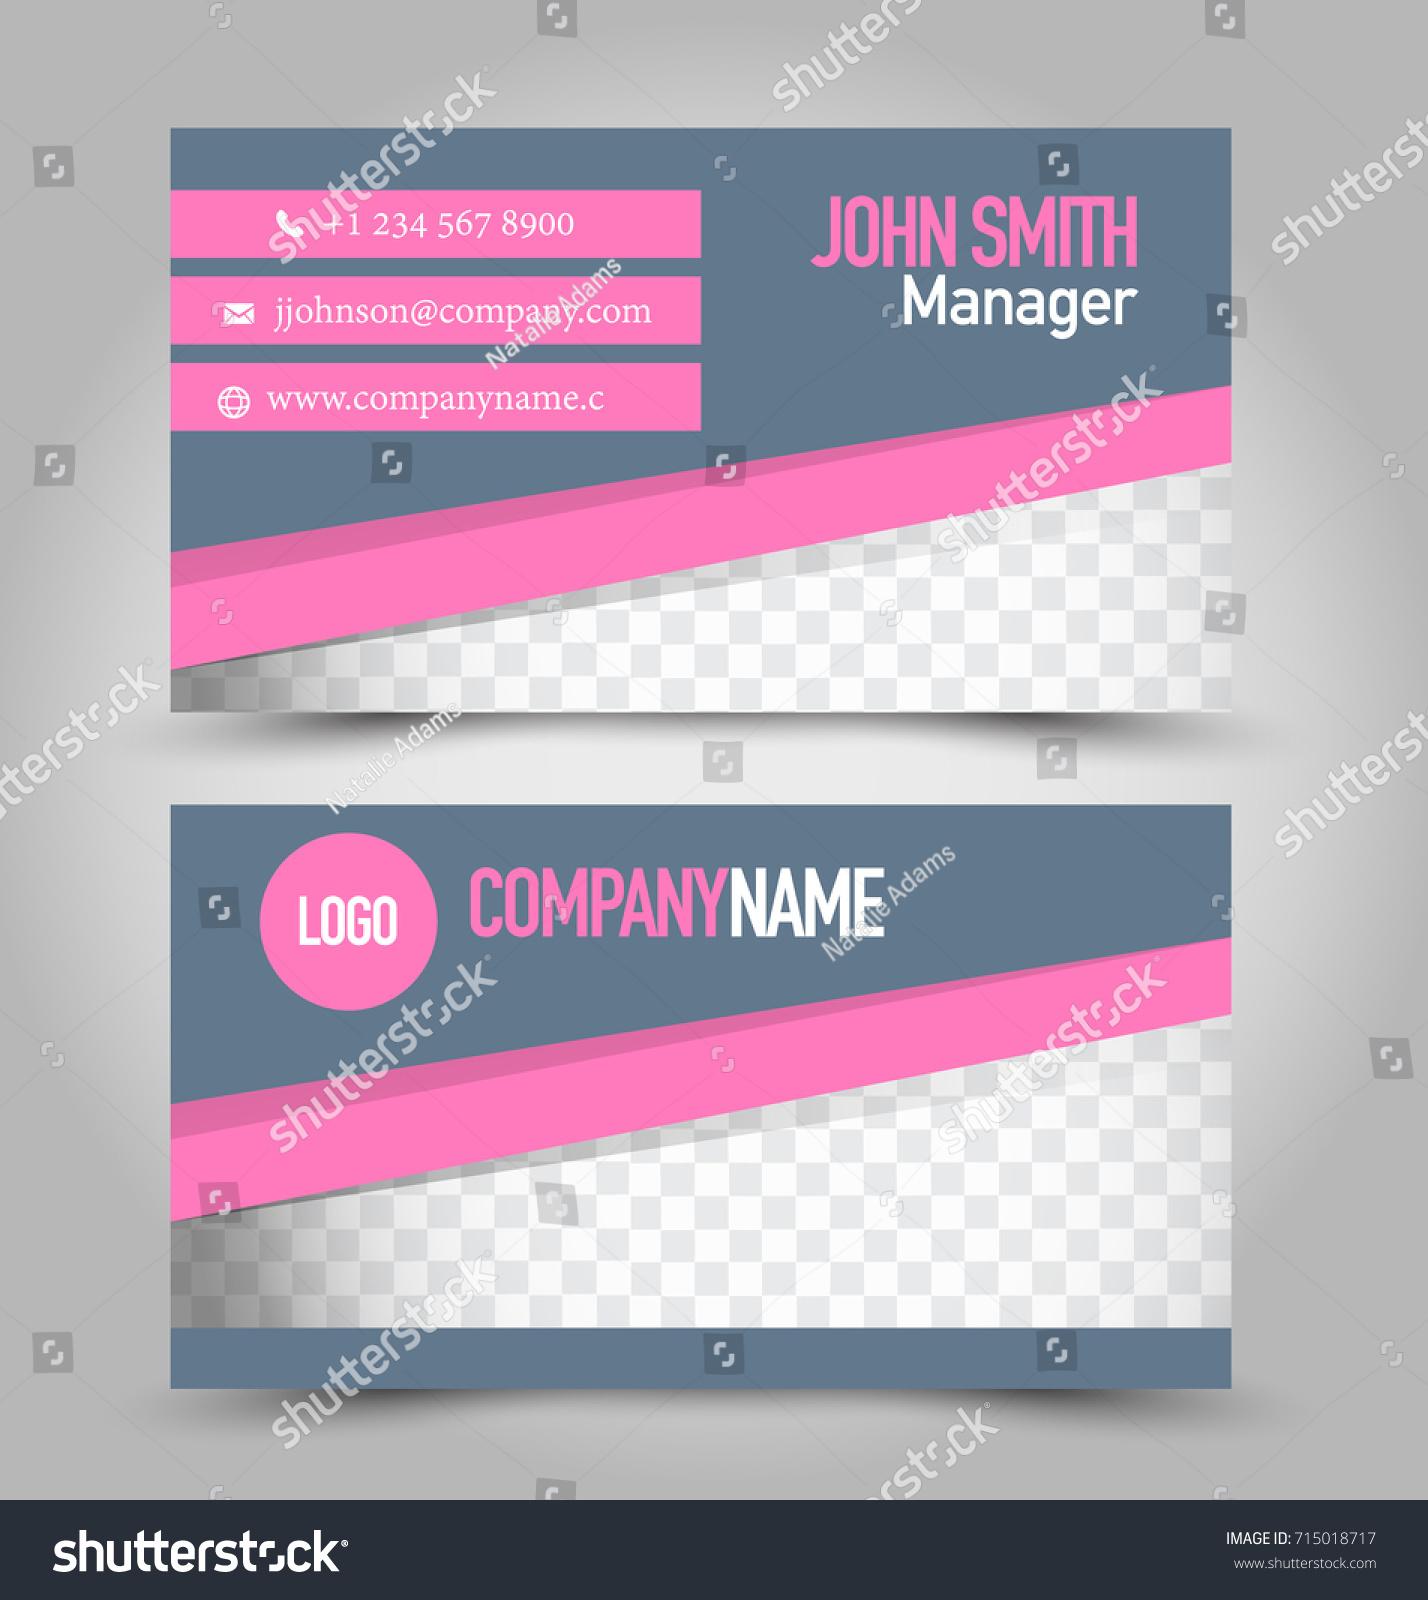 Business Card Template Design Corporate Identity Stock Vector